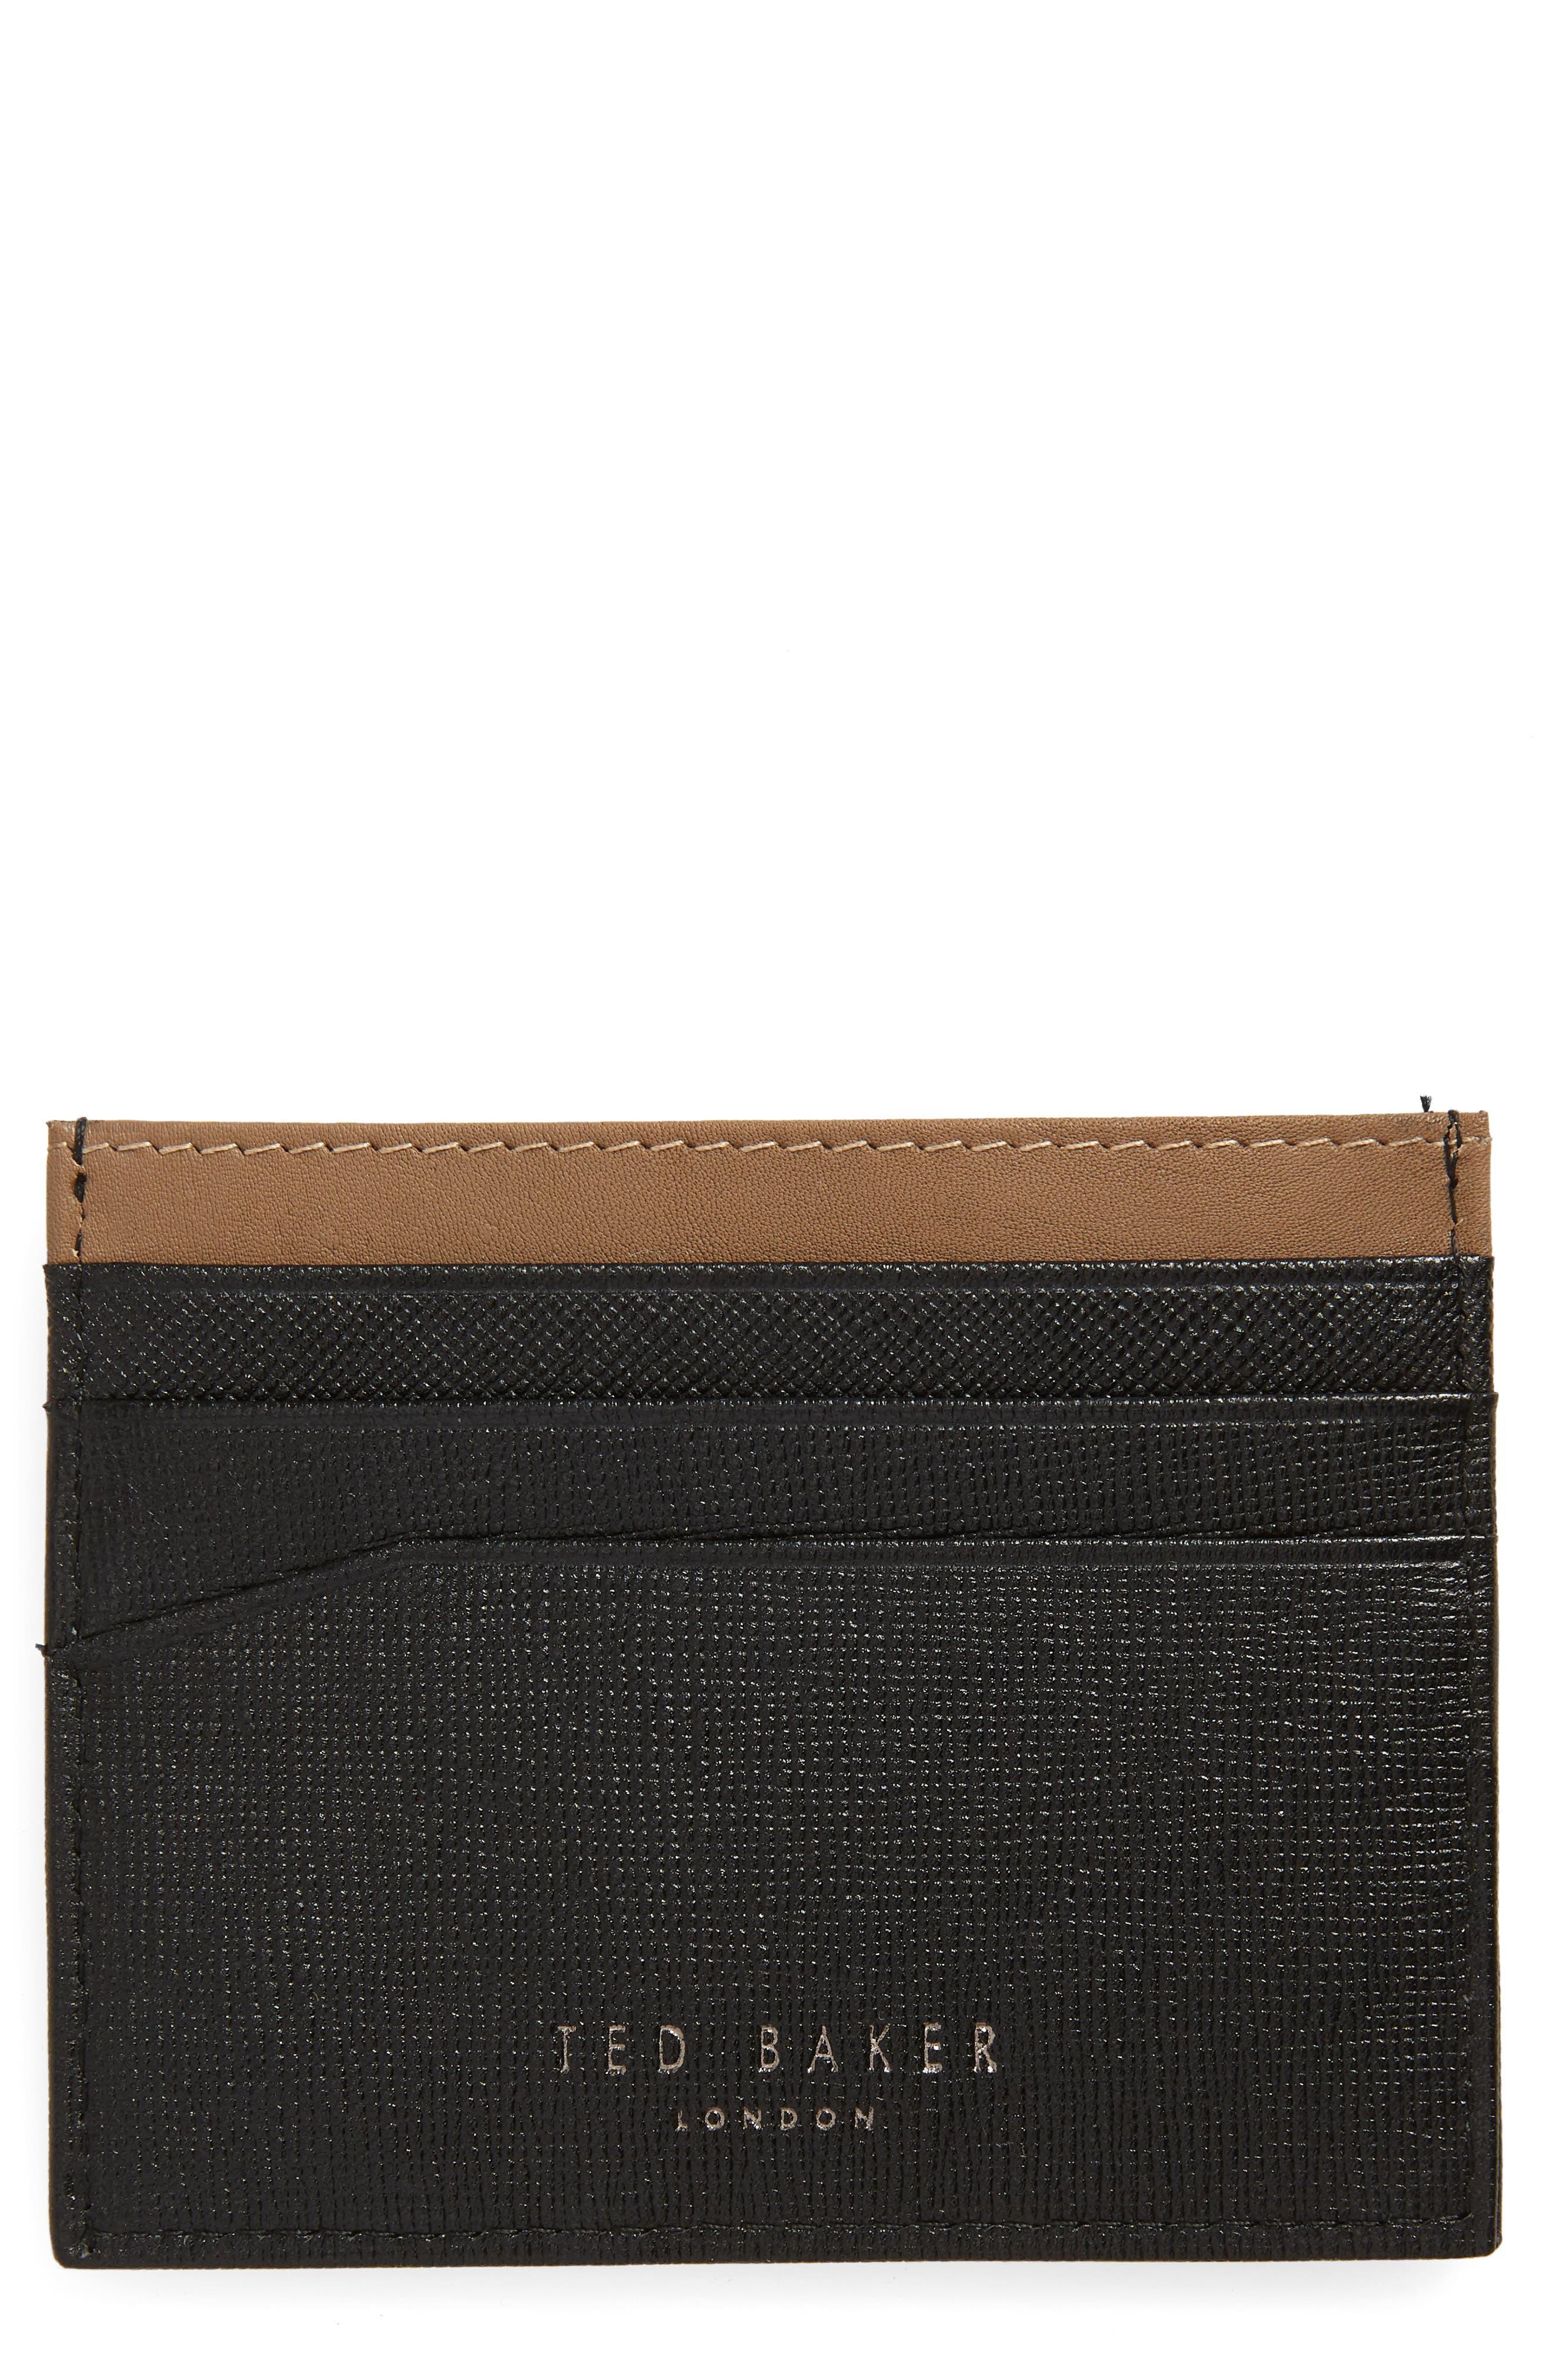 Stripe Leather Card Case,                             Main thumbnail 1, color,                             BLACK